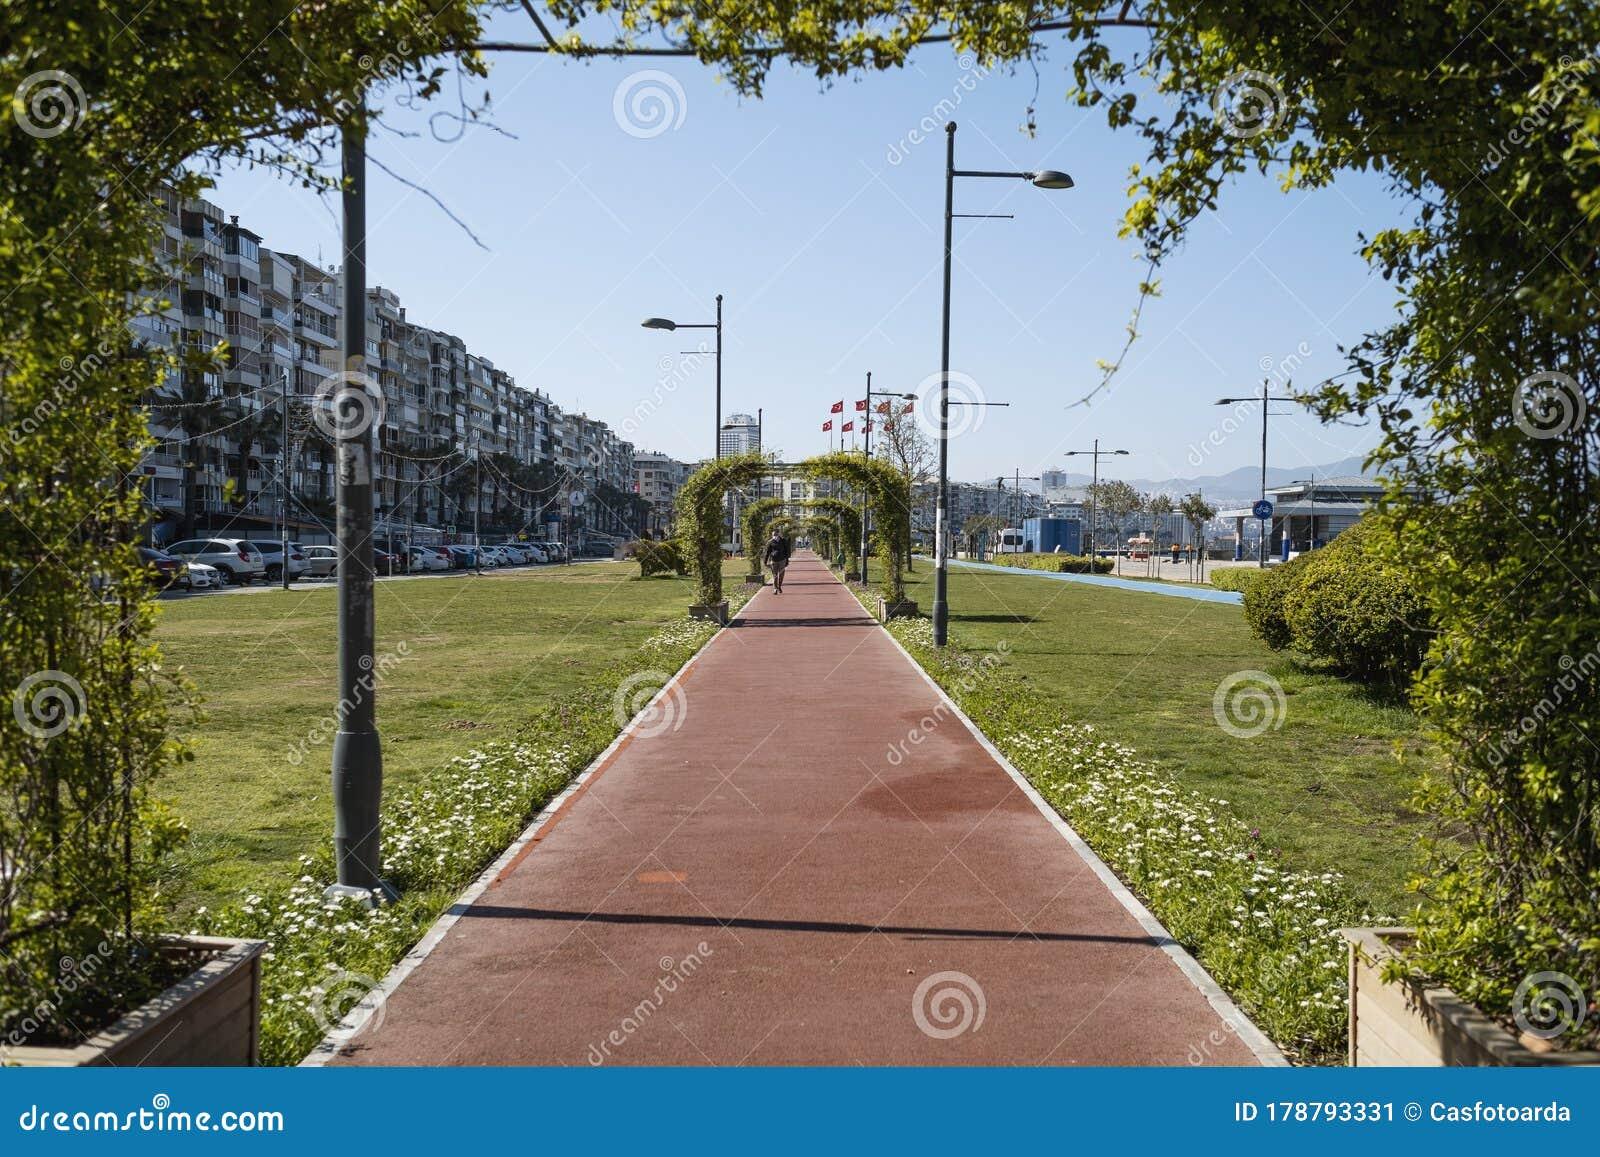 Alsancak Kordon Is Empty Streets Because Of Coronavirus Pandemi People Of Is Izmir Is Staying Home Editorial Photo Image Of Coronavirus Cord 178793331